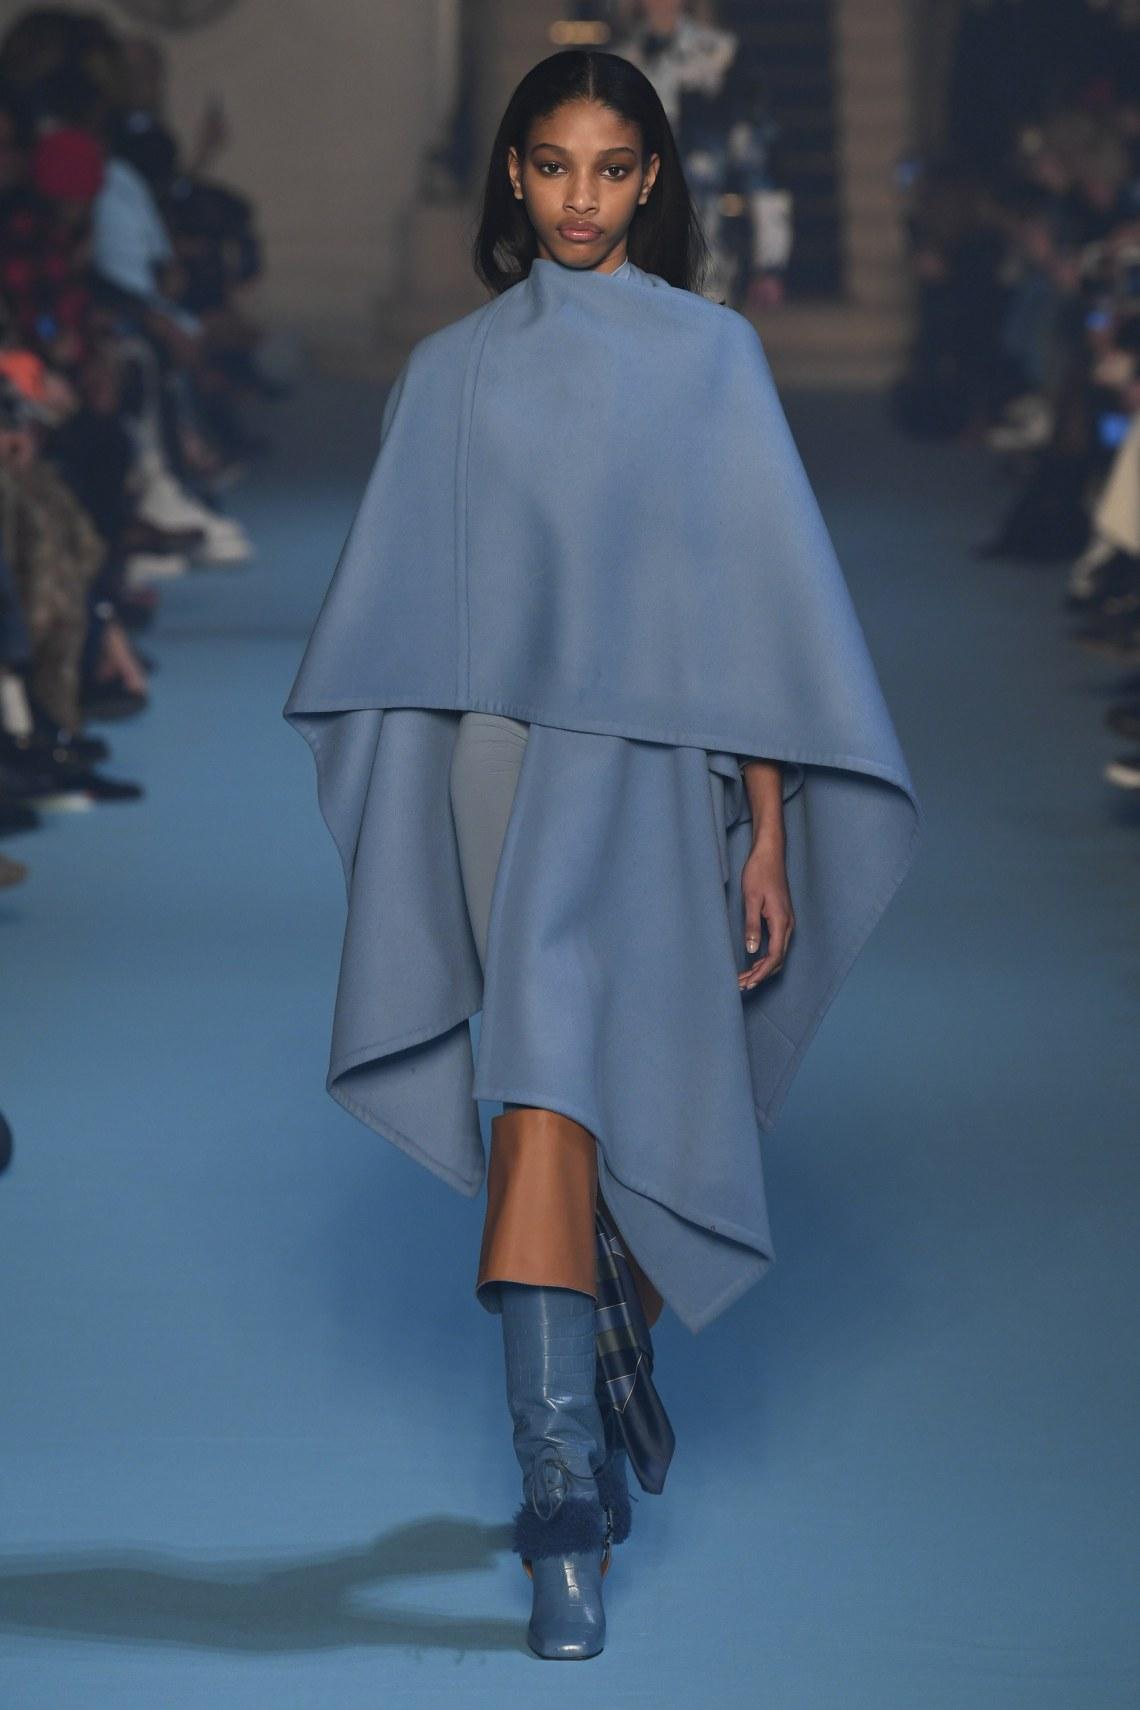 virgil-abloh-louis vuitton new menswear designer- off-white-fall.jpg